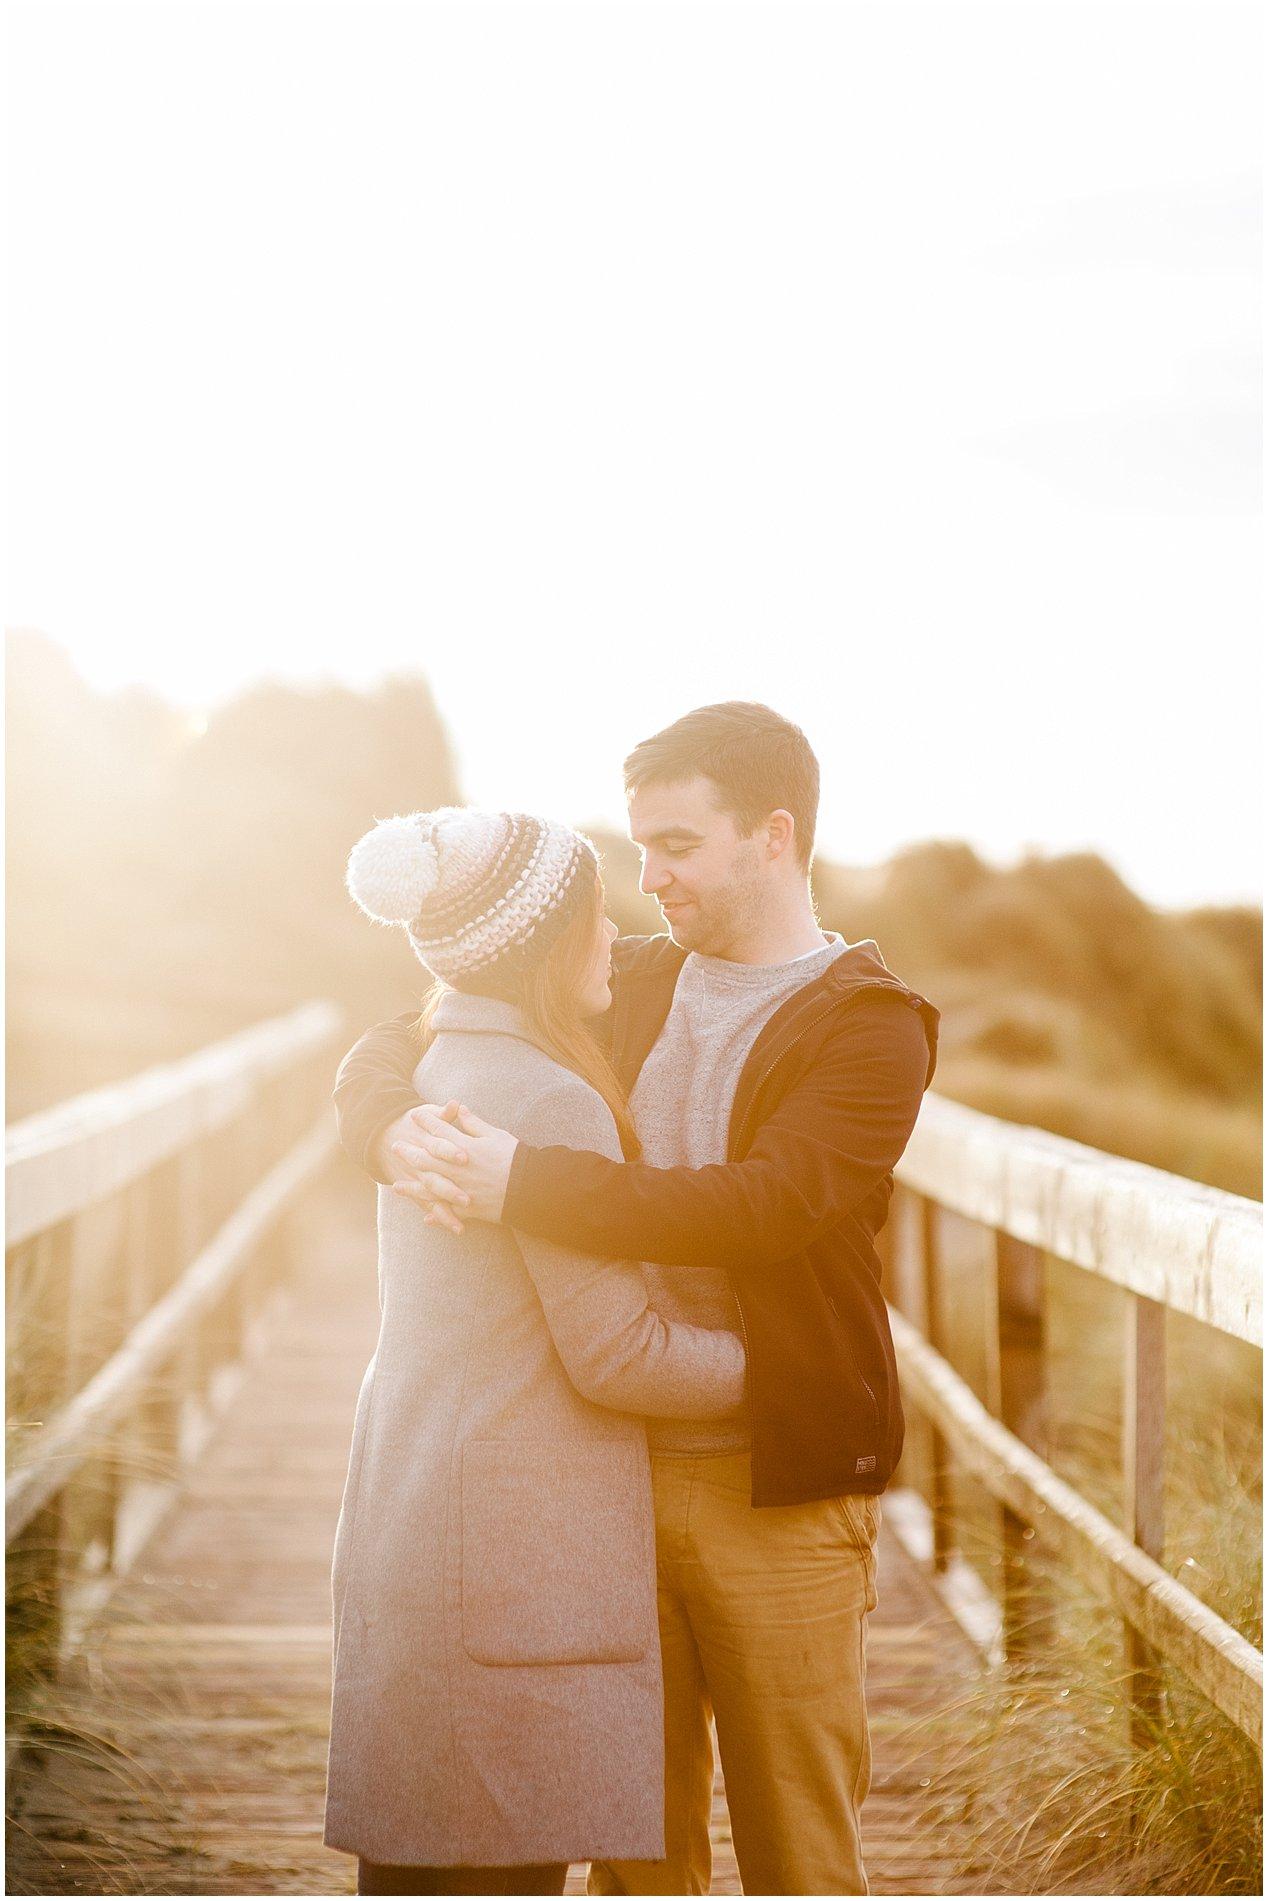 Sinead_Emmet_Rossnowlagh_Beach_pre_wedding_jude_browne_photography_0013.jpg